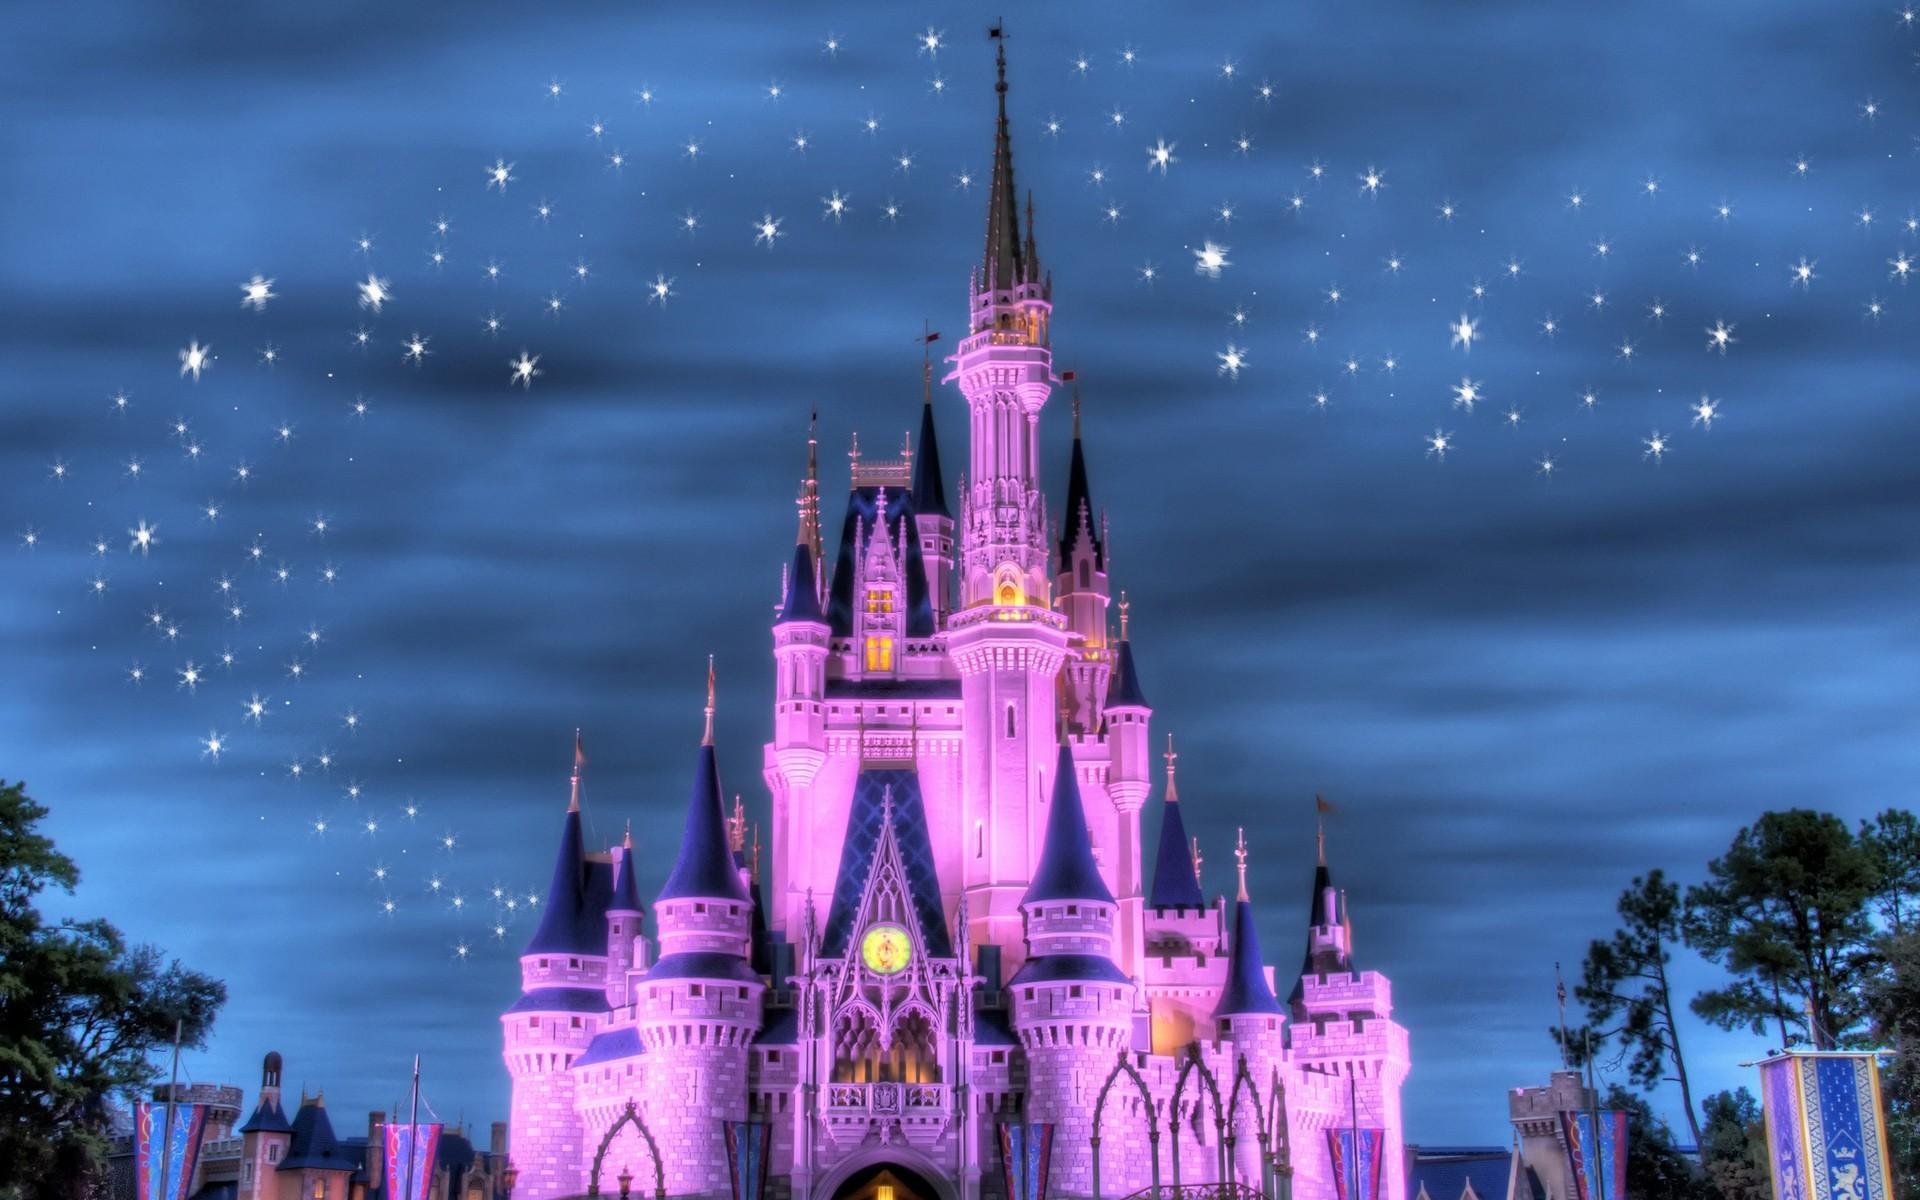 free Castles Disney wallpaper, resolution : 1920 x tags: Castles, Disney,  Magical.